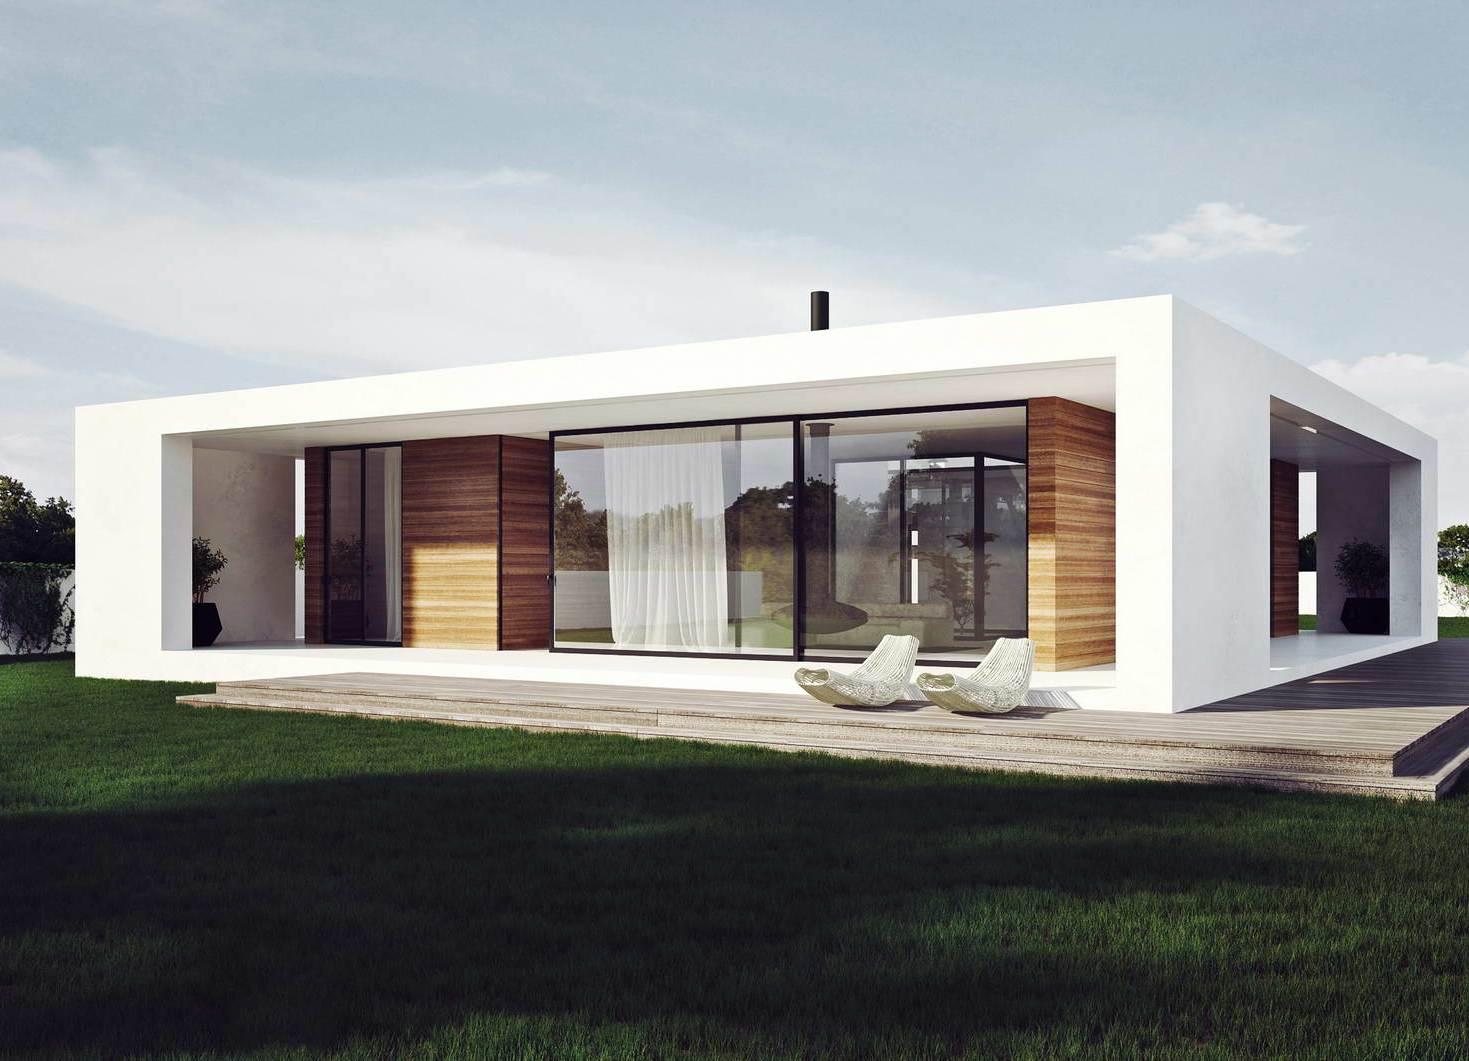 Casas minimalistas baratas ideas de disenos for Casas minimalistas baratas